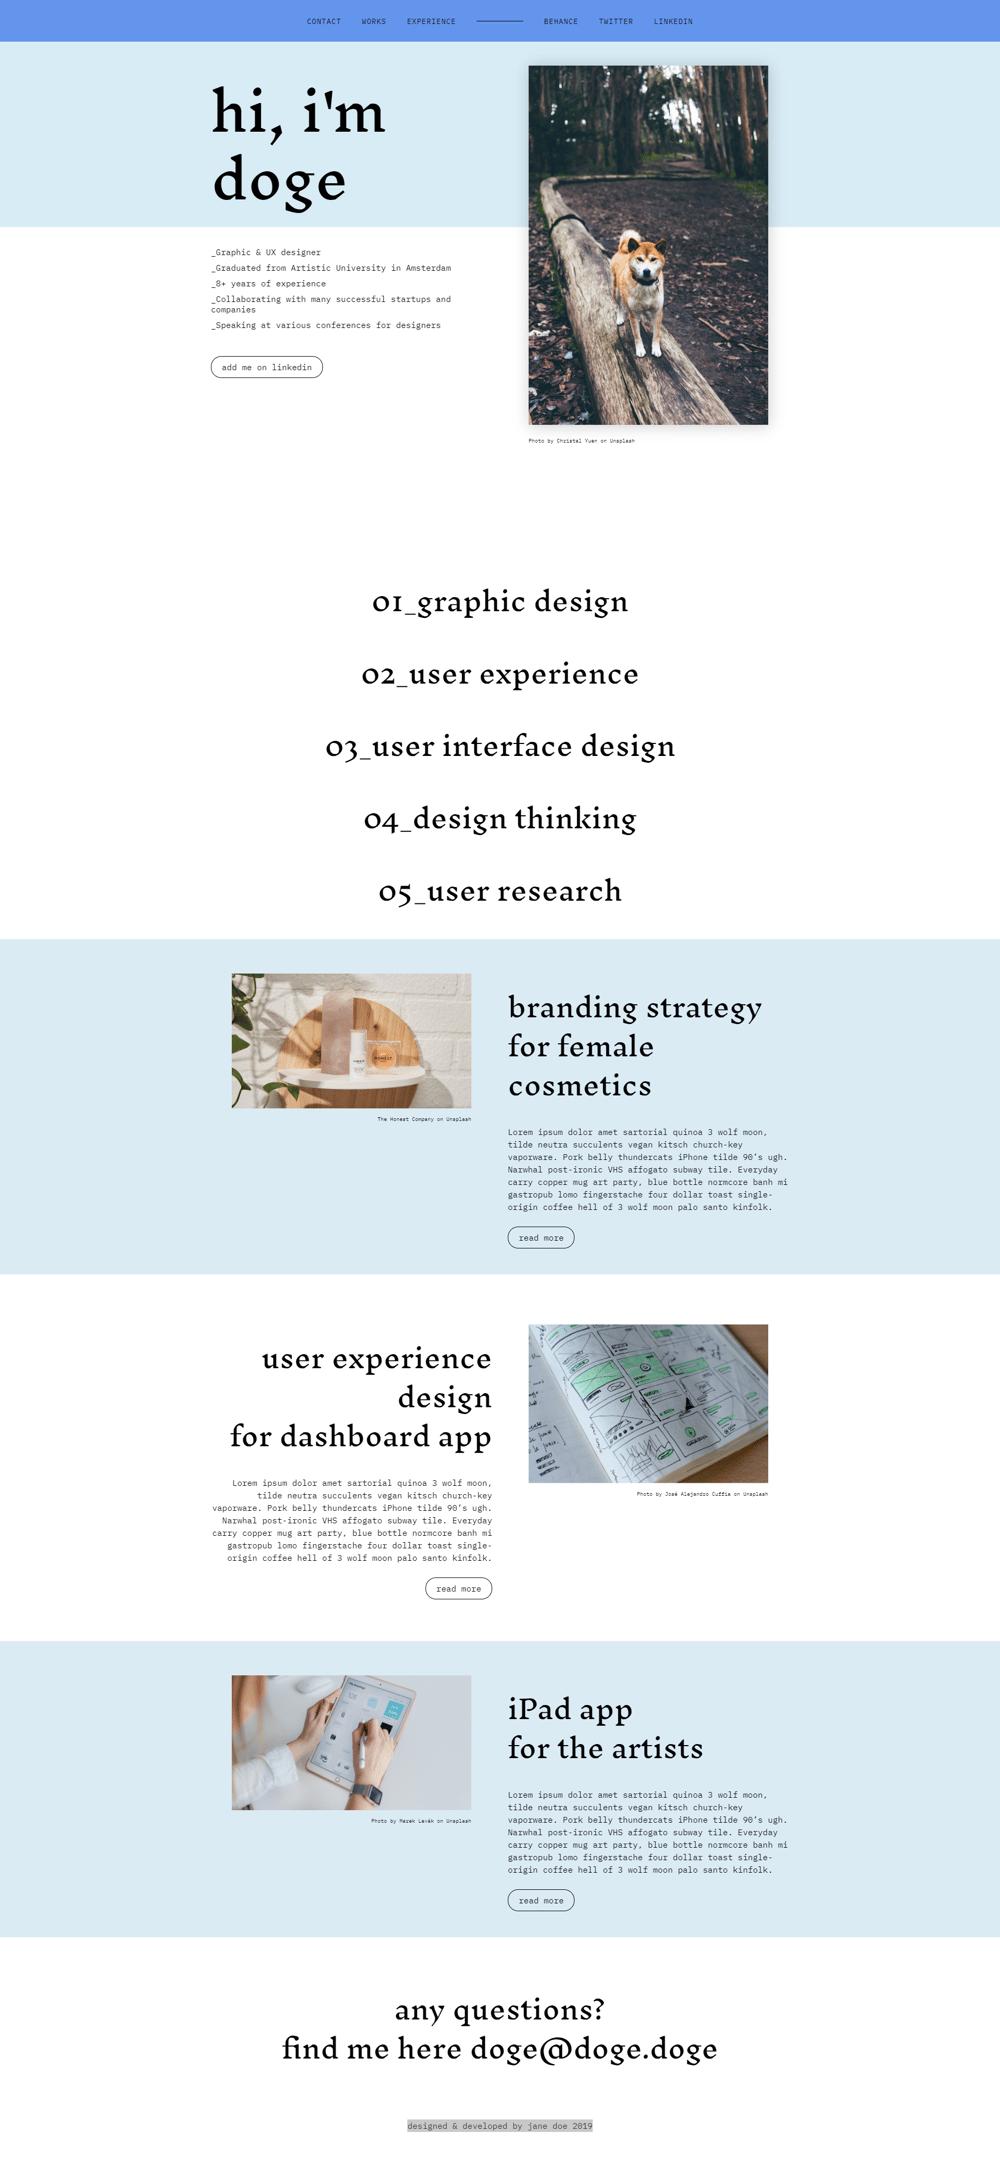 Doge portfolio example site - image 1 - student project